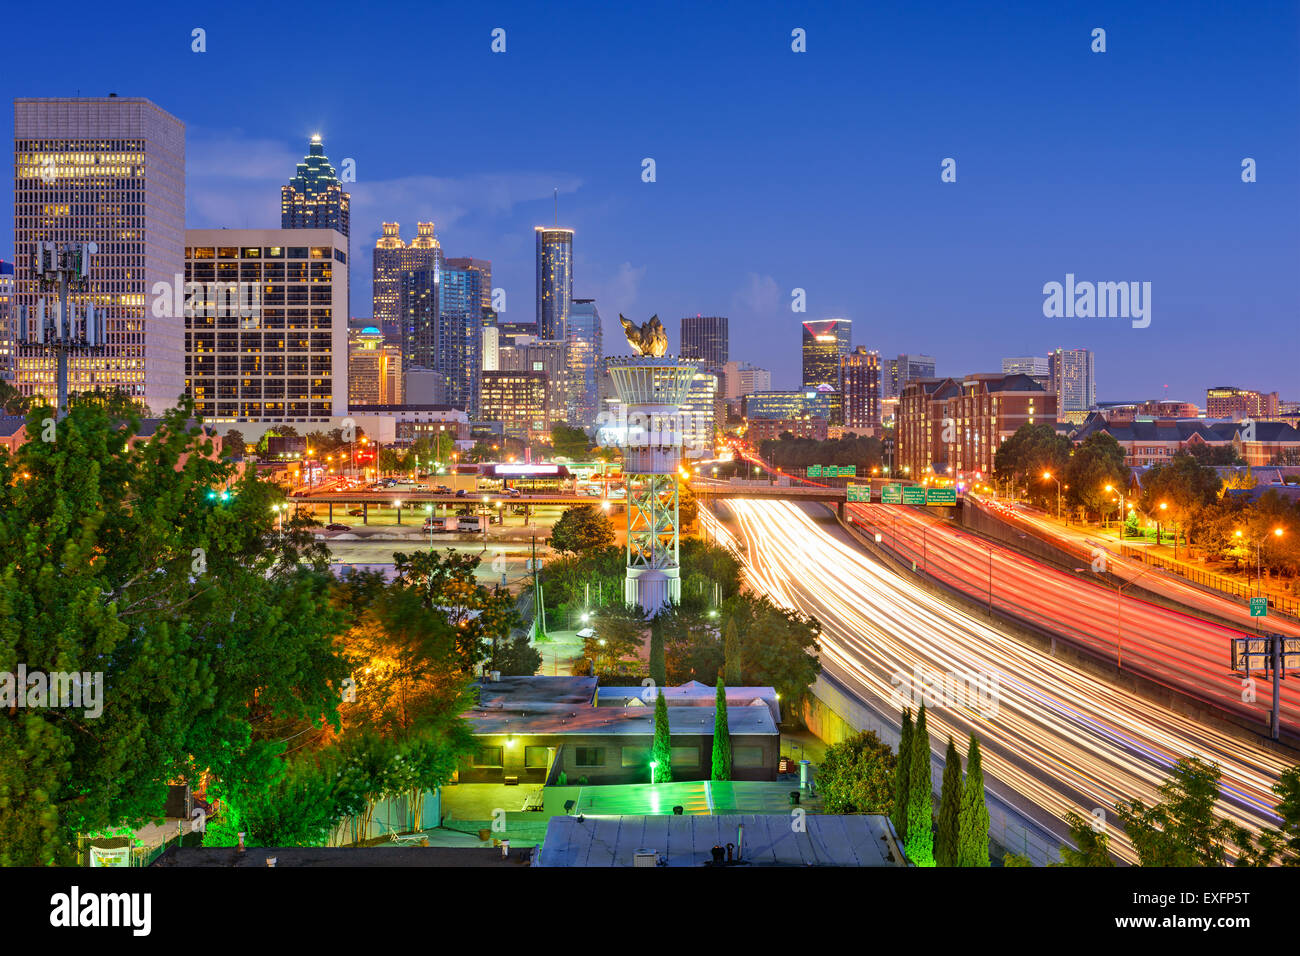 Atlanta, Georgia, USA downtown skyline over Interstate 85. - Stock Image